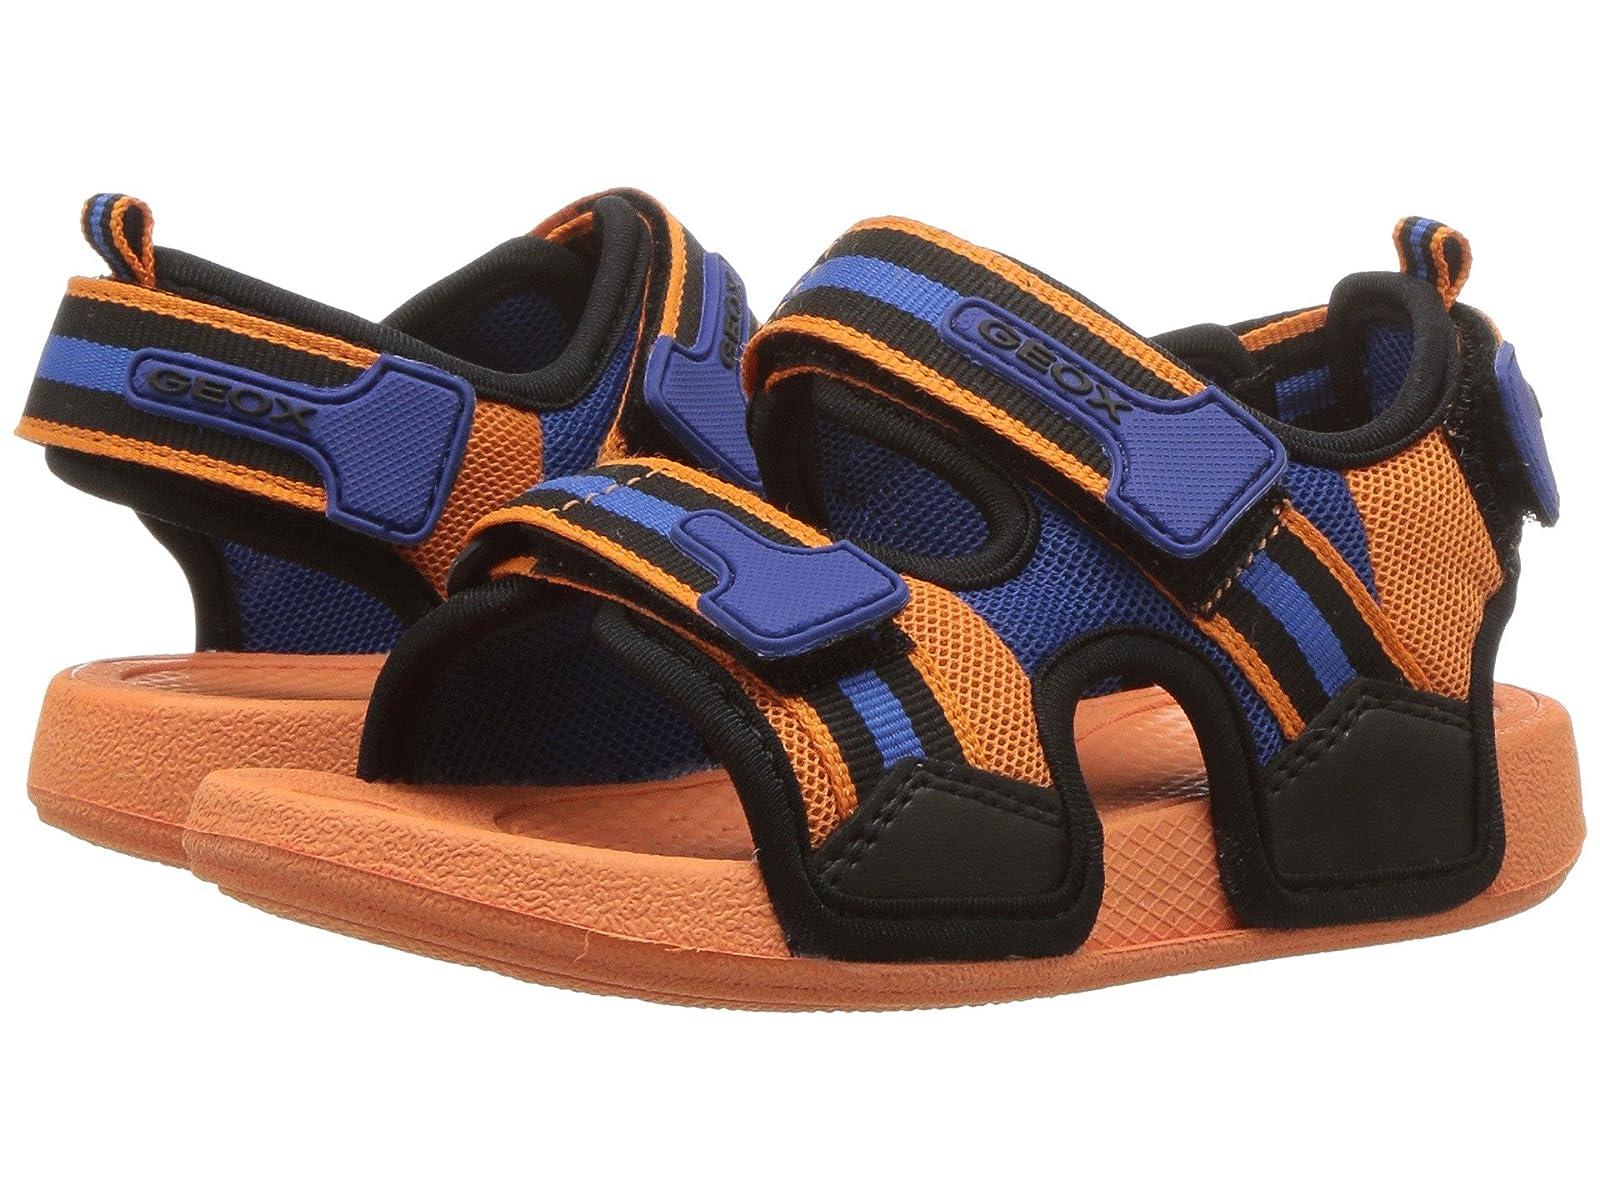 Geox Kids Ultrak 1 (Toddler/Little Kid)Atmospheric grades have affordable shoes